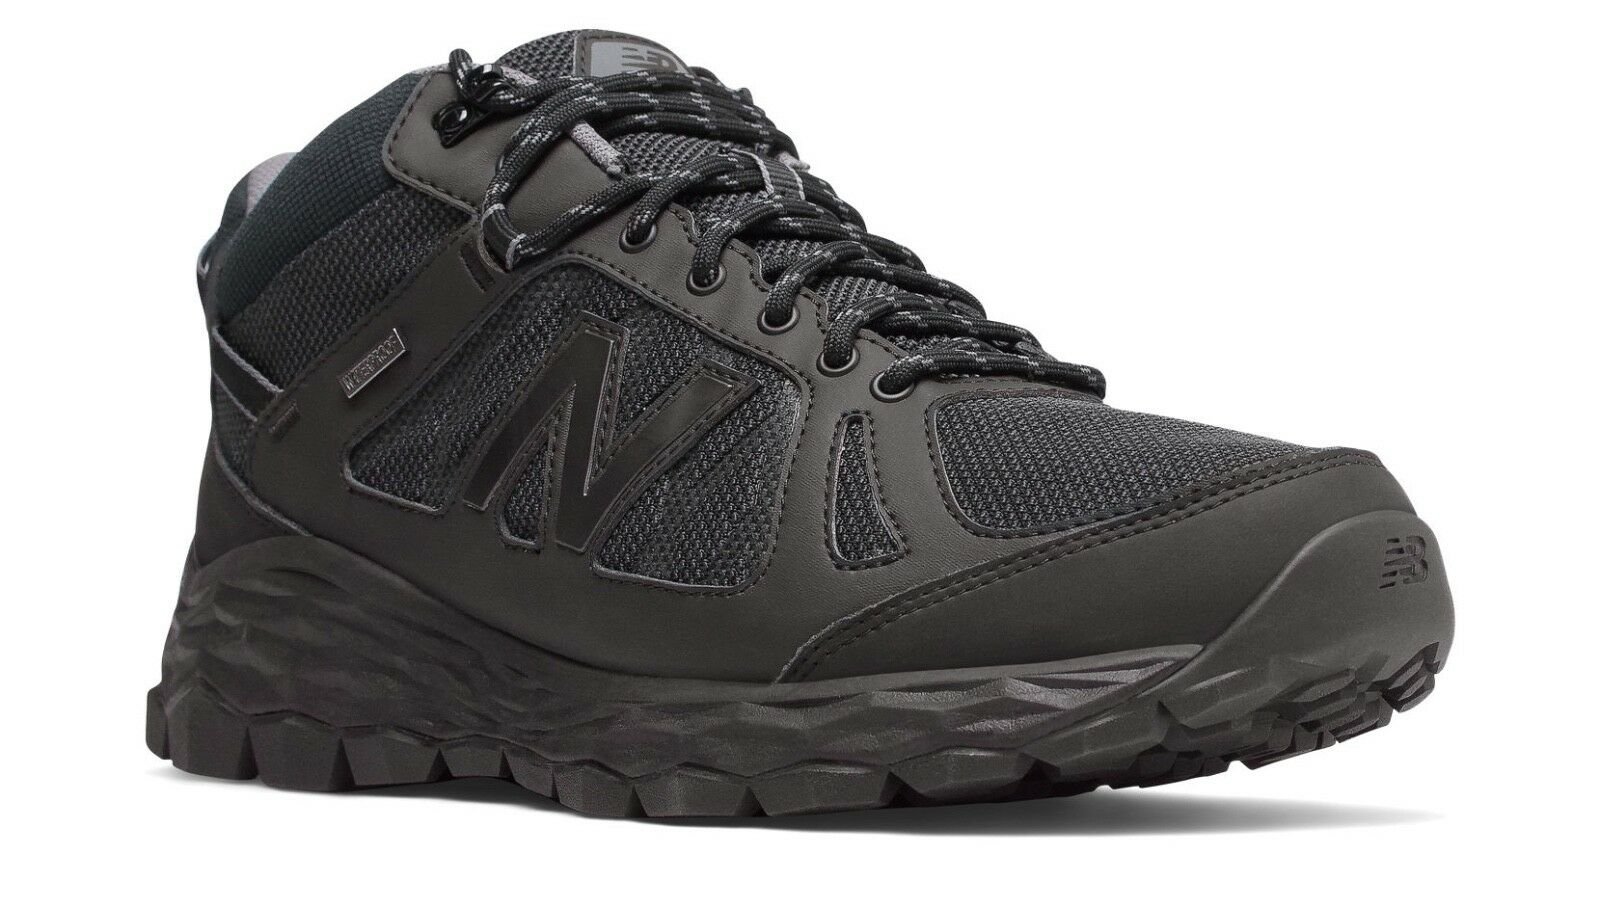 Men's New Balance 1450 US 8 4E EU 41.5 MW1450WK Trail Walking